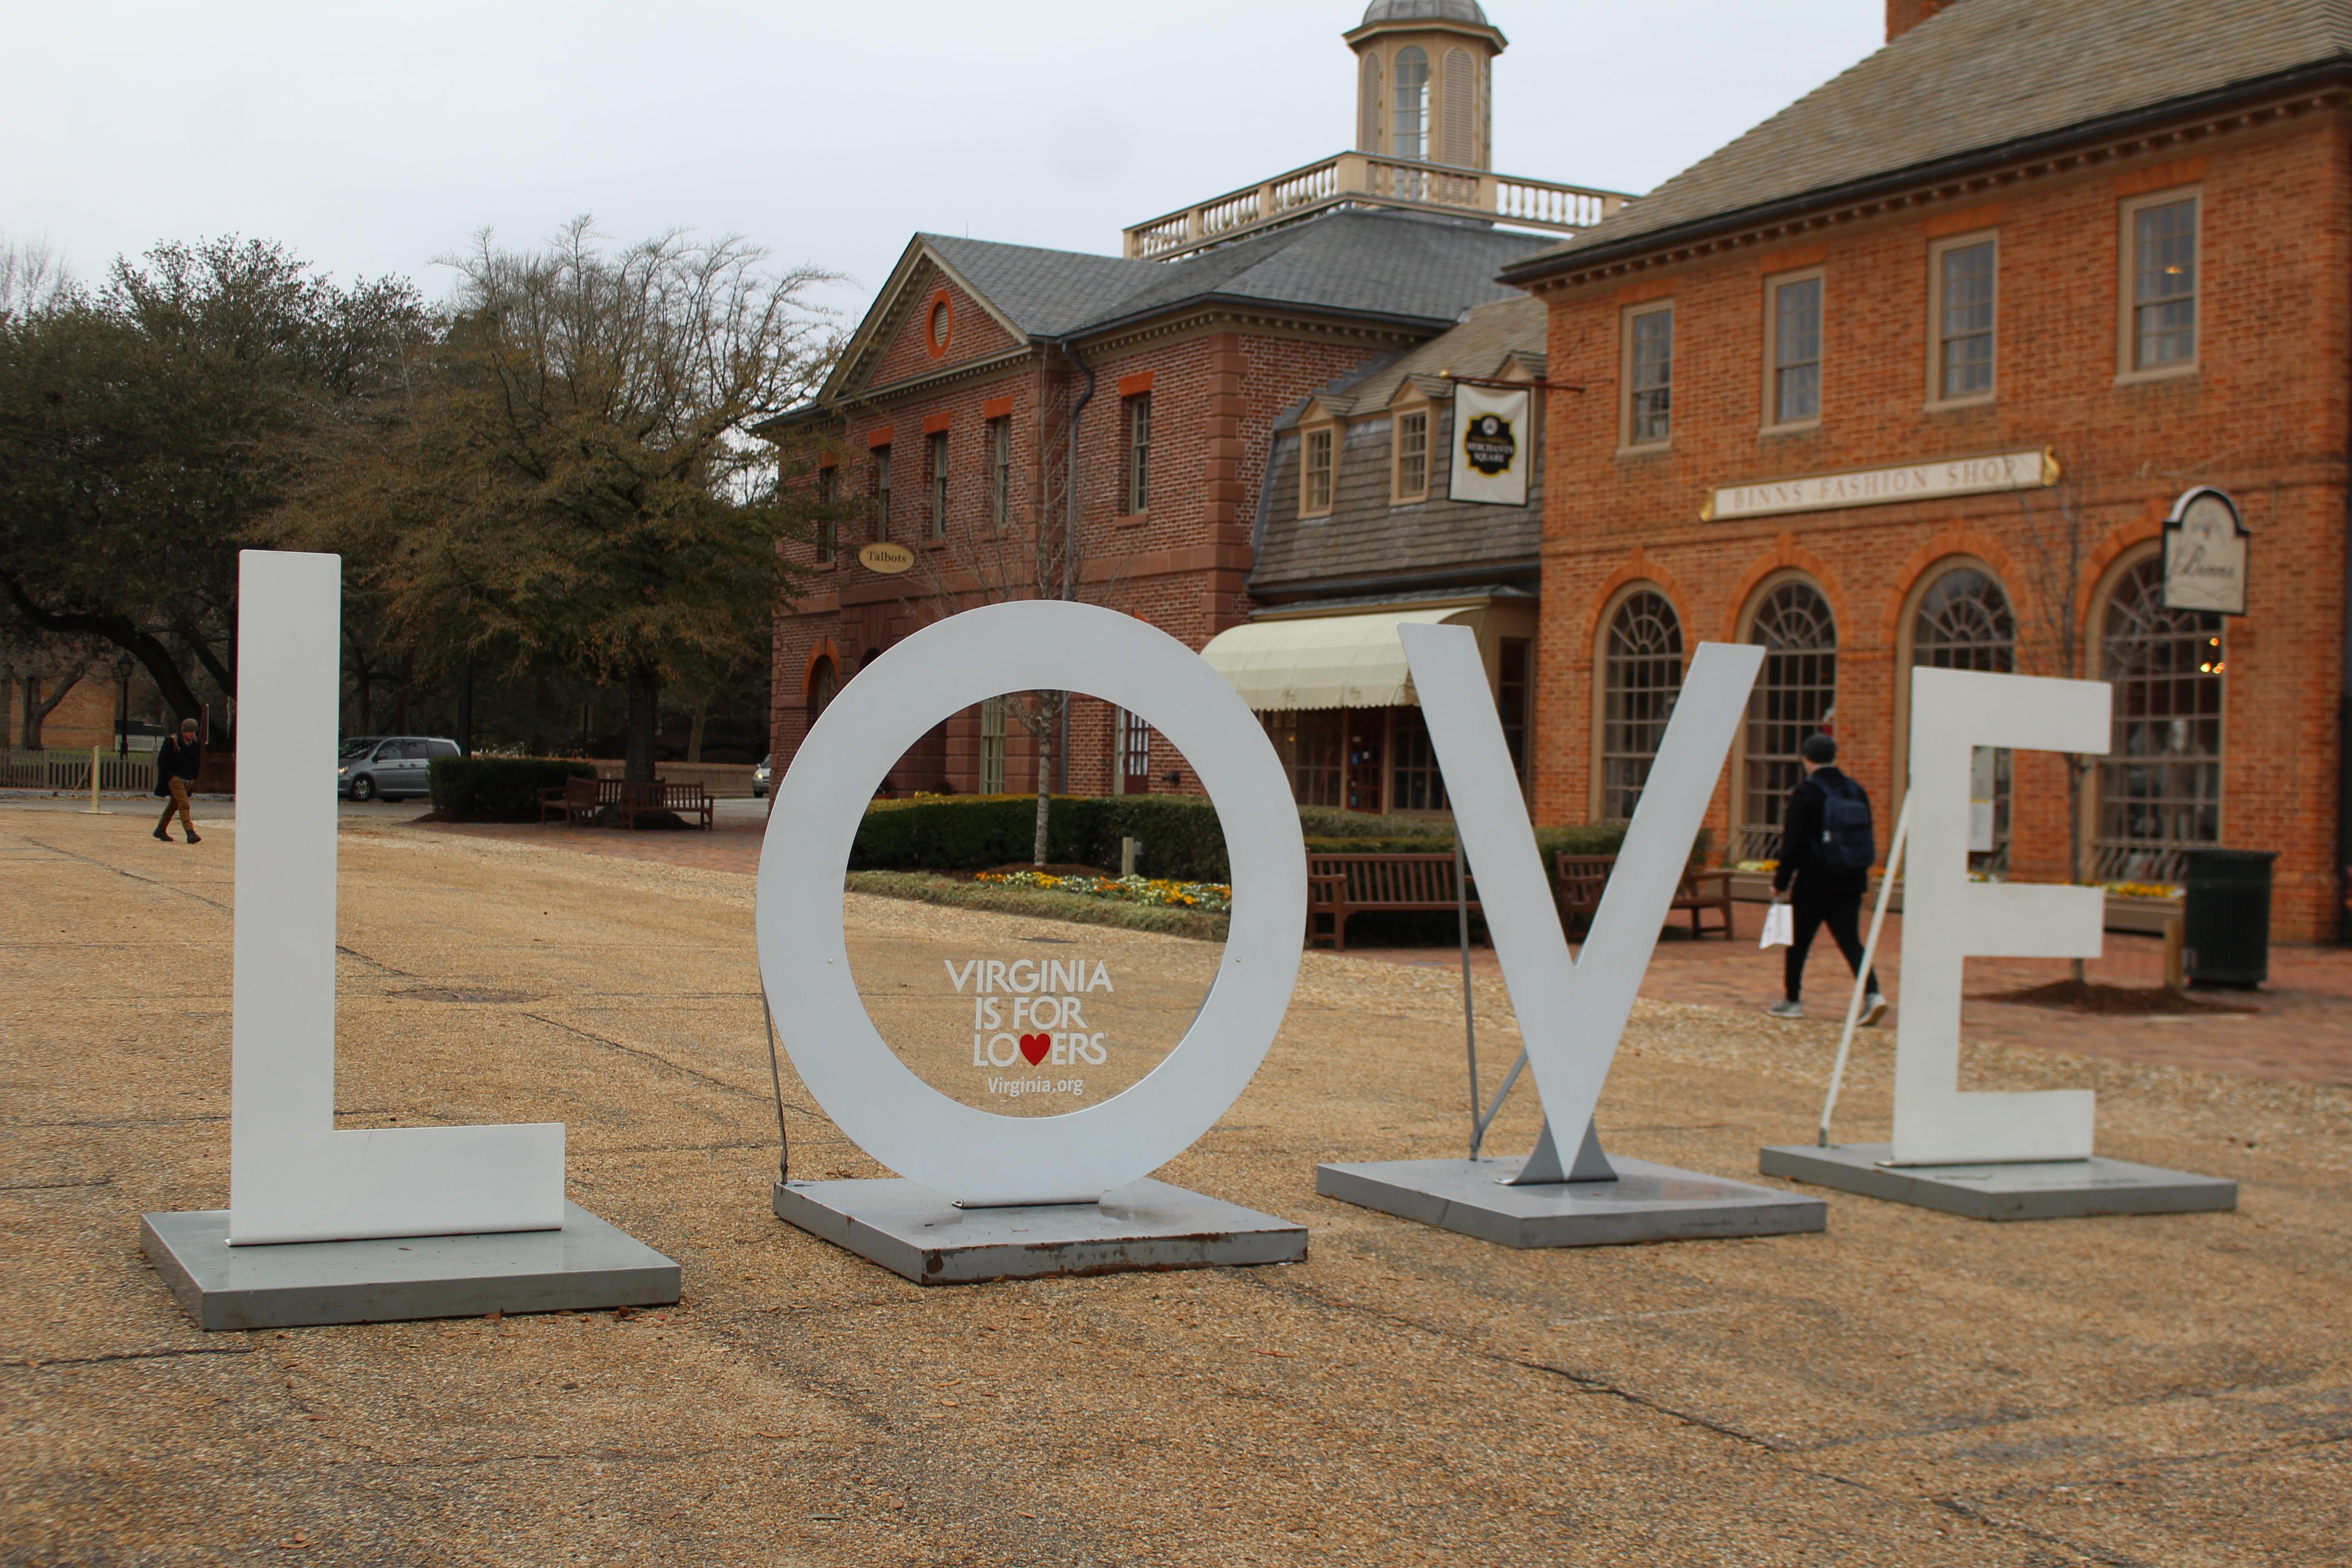 love i Virginia om dating hvordan man starter gratis online dating site